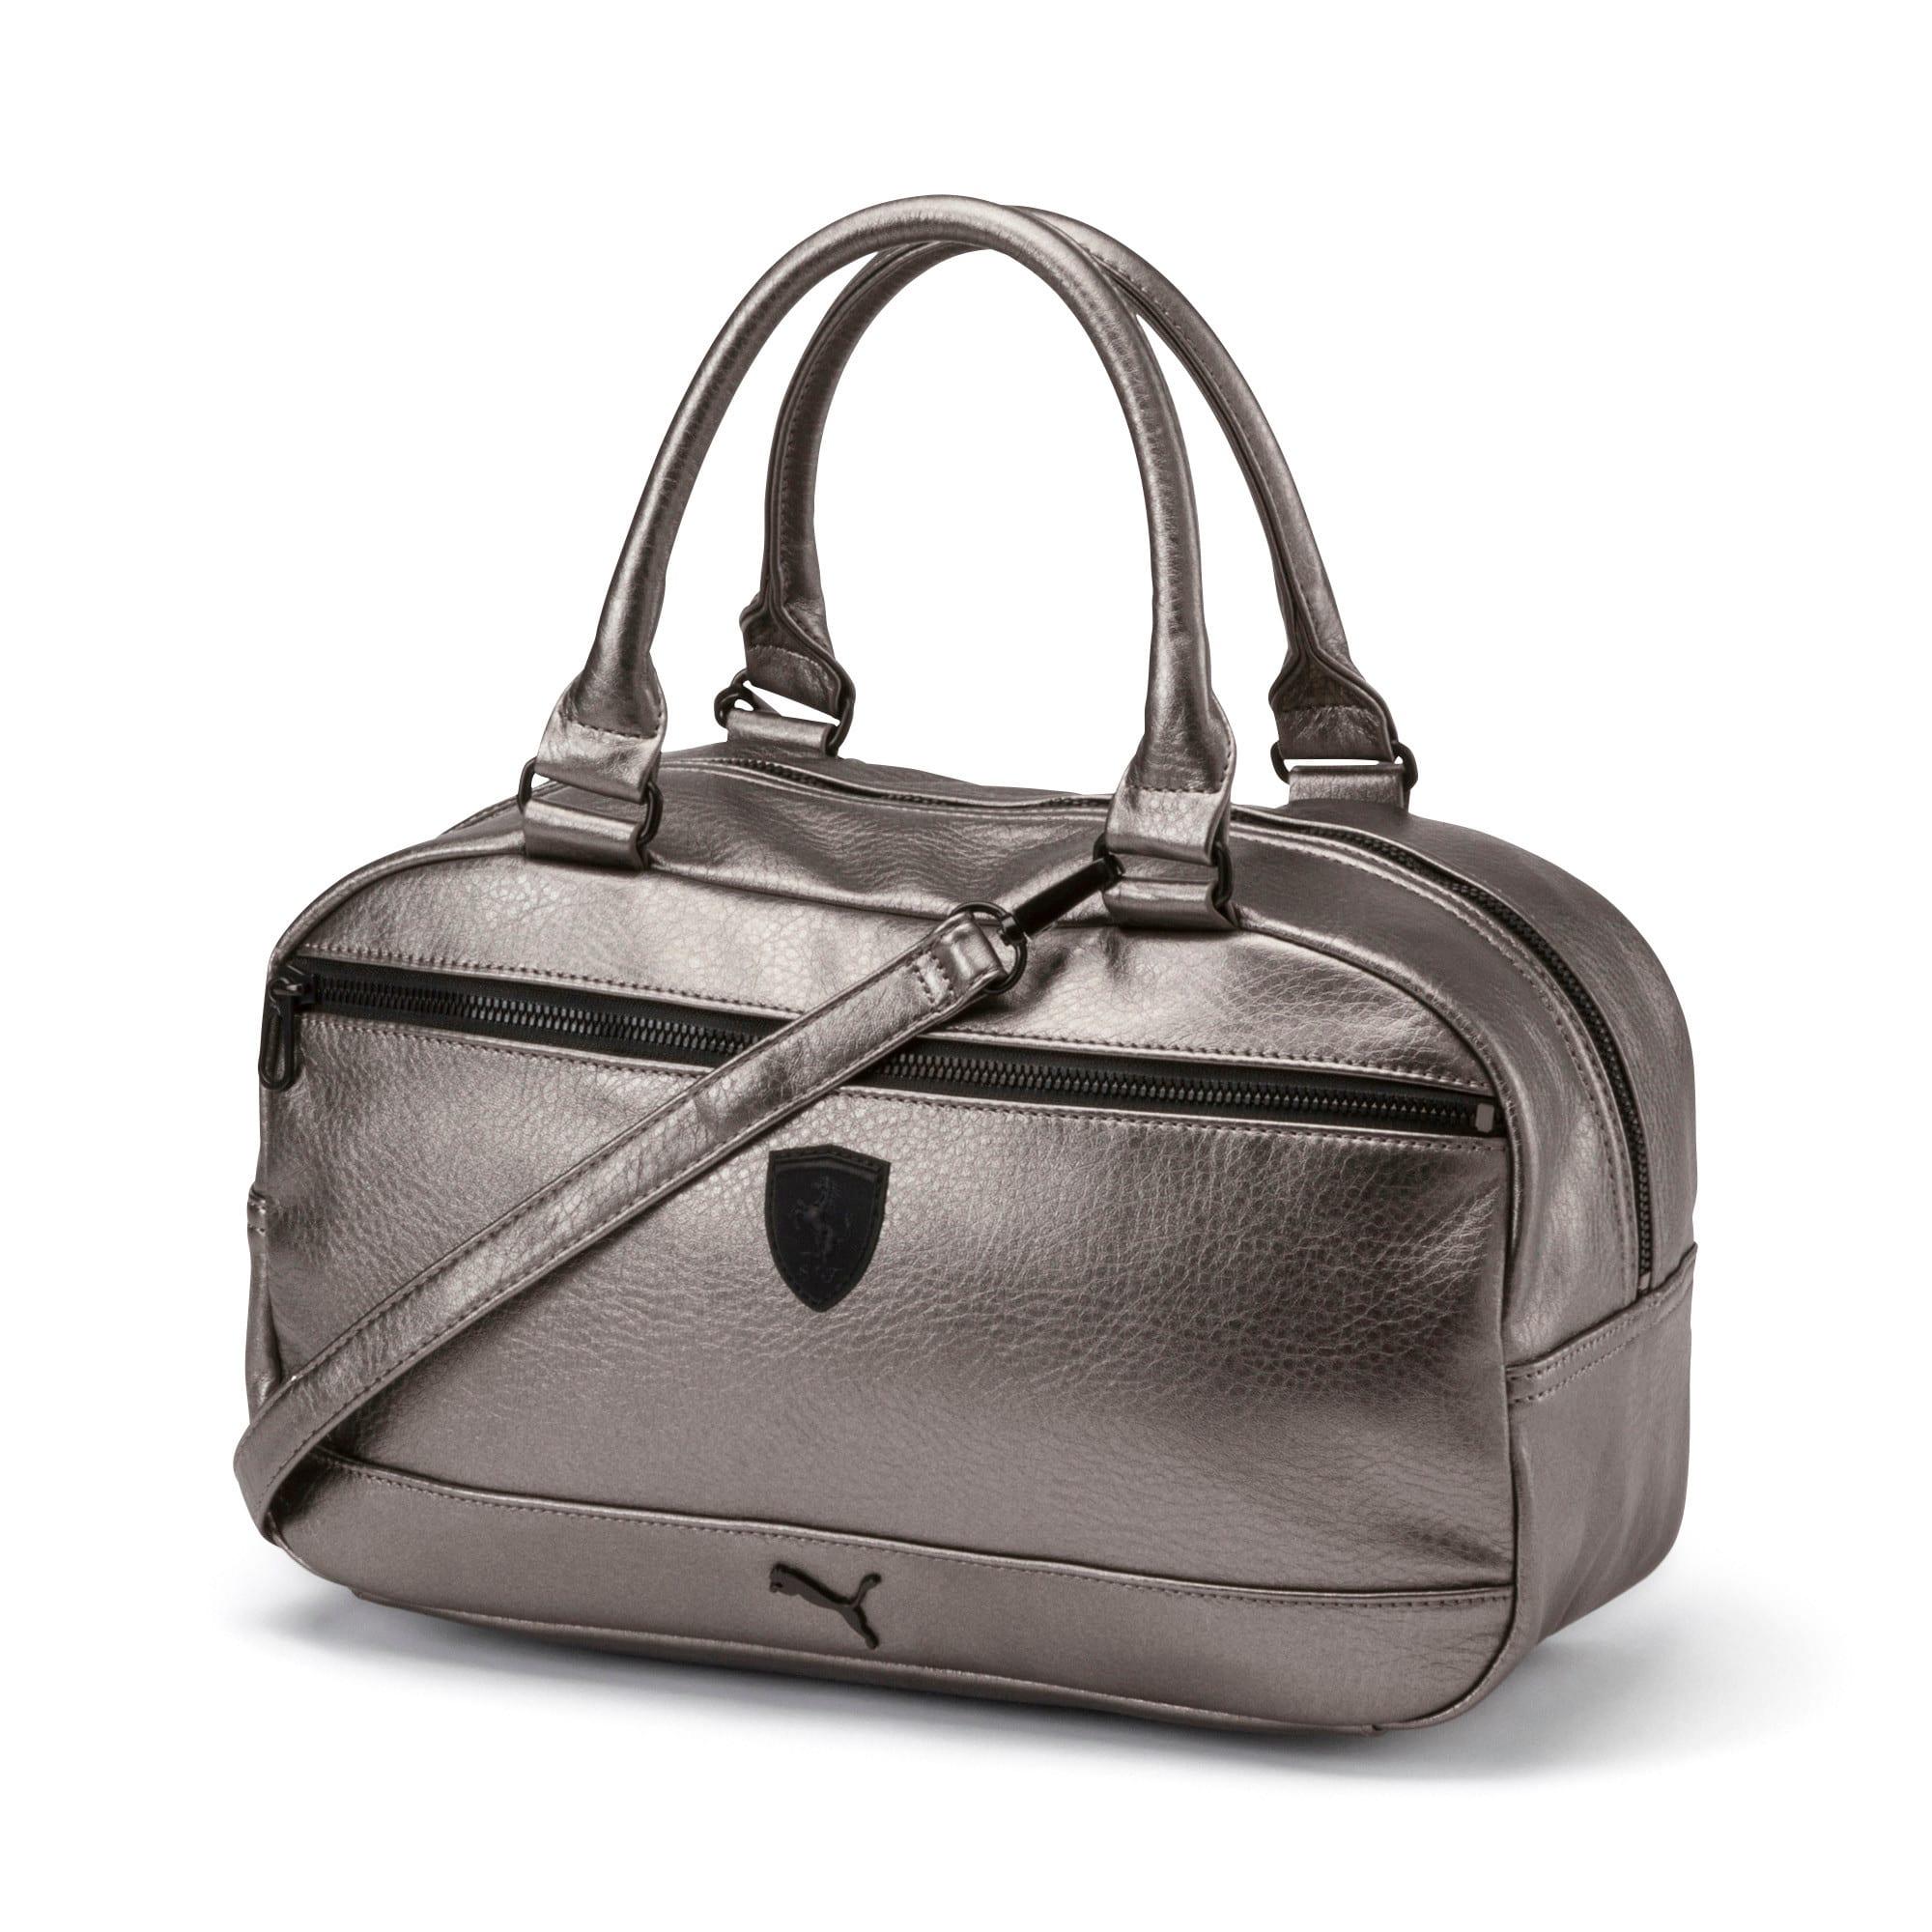 Thumbnail 1 of SF LS Handbag Metallic Ash, Metallic Ash, medium-IND